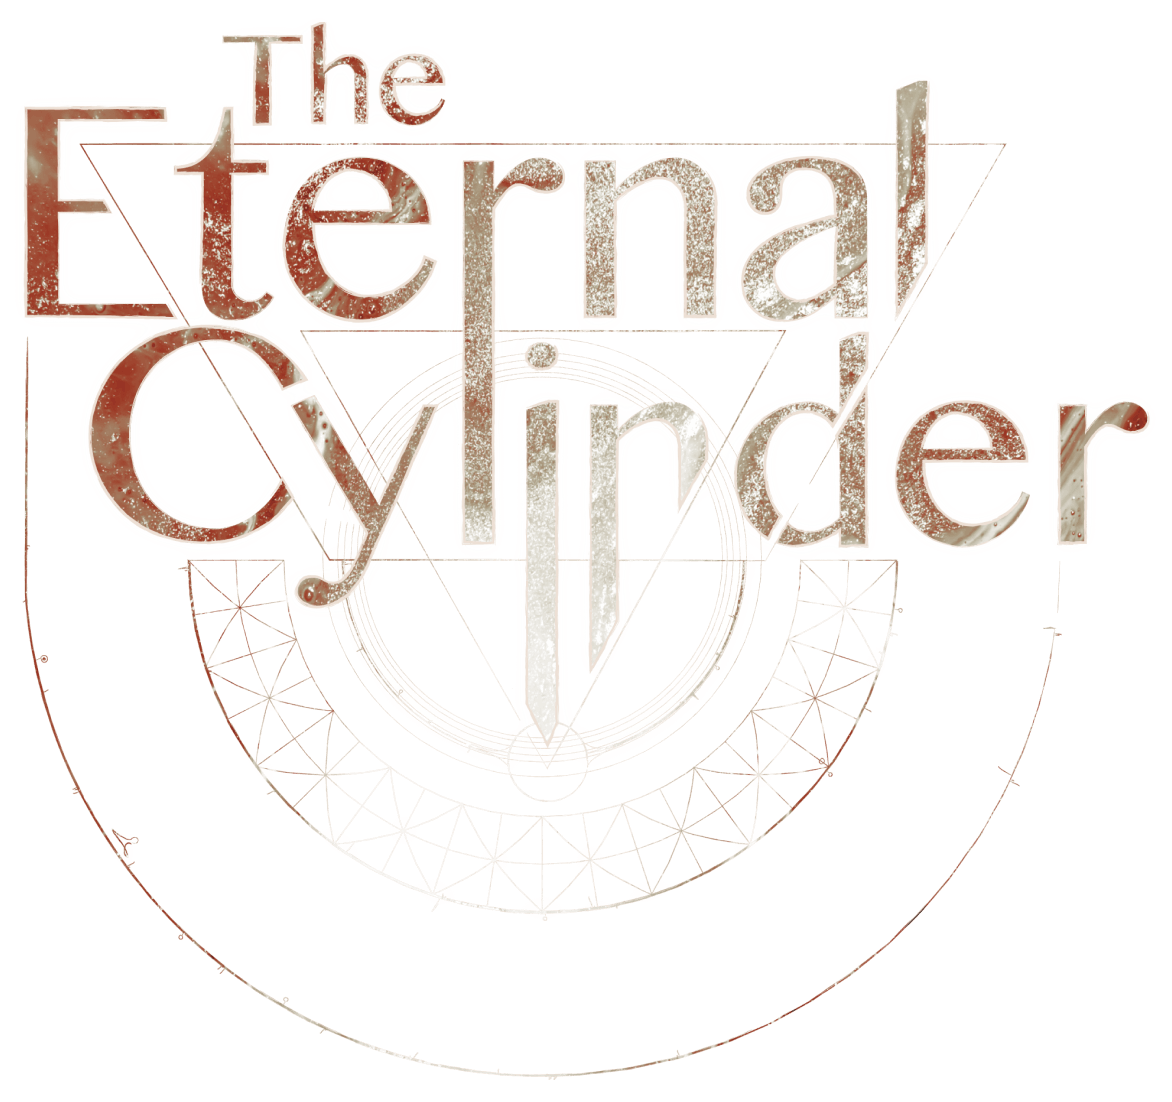 Eternal Cylinder logo